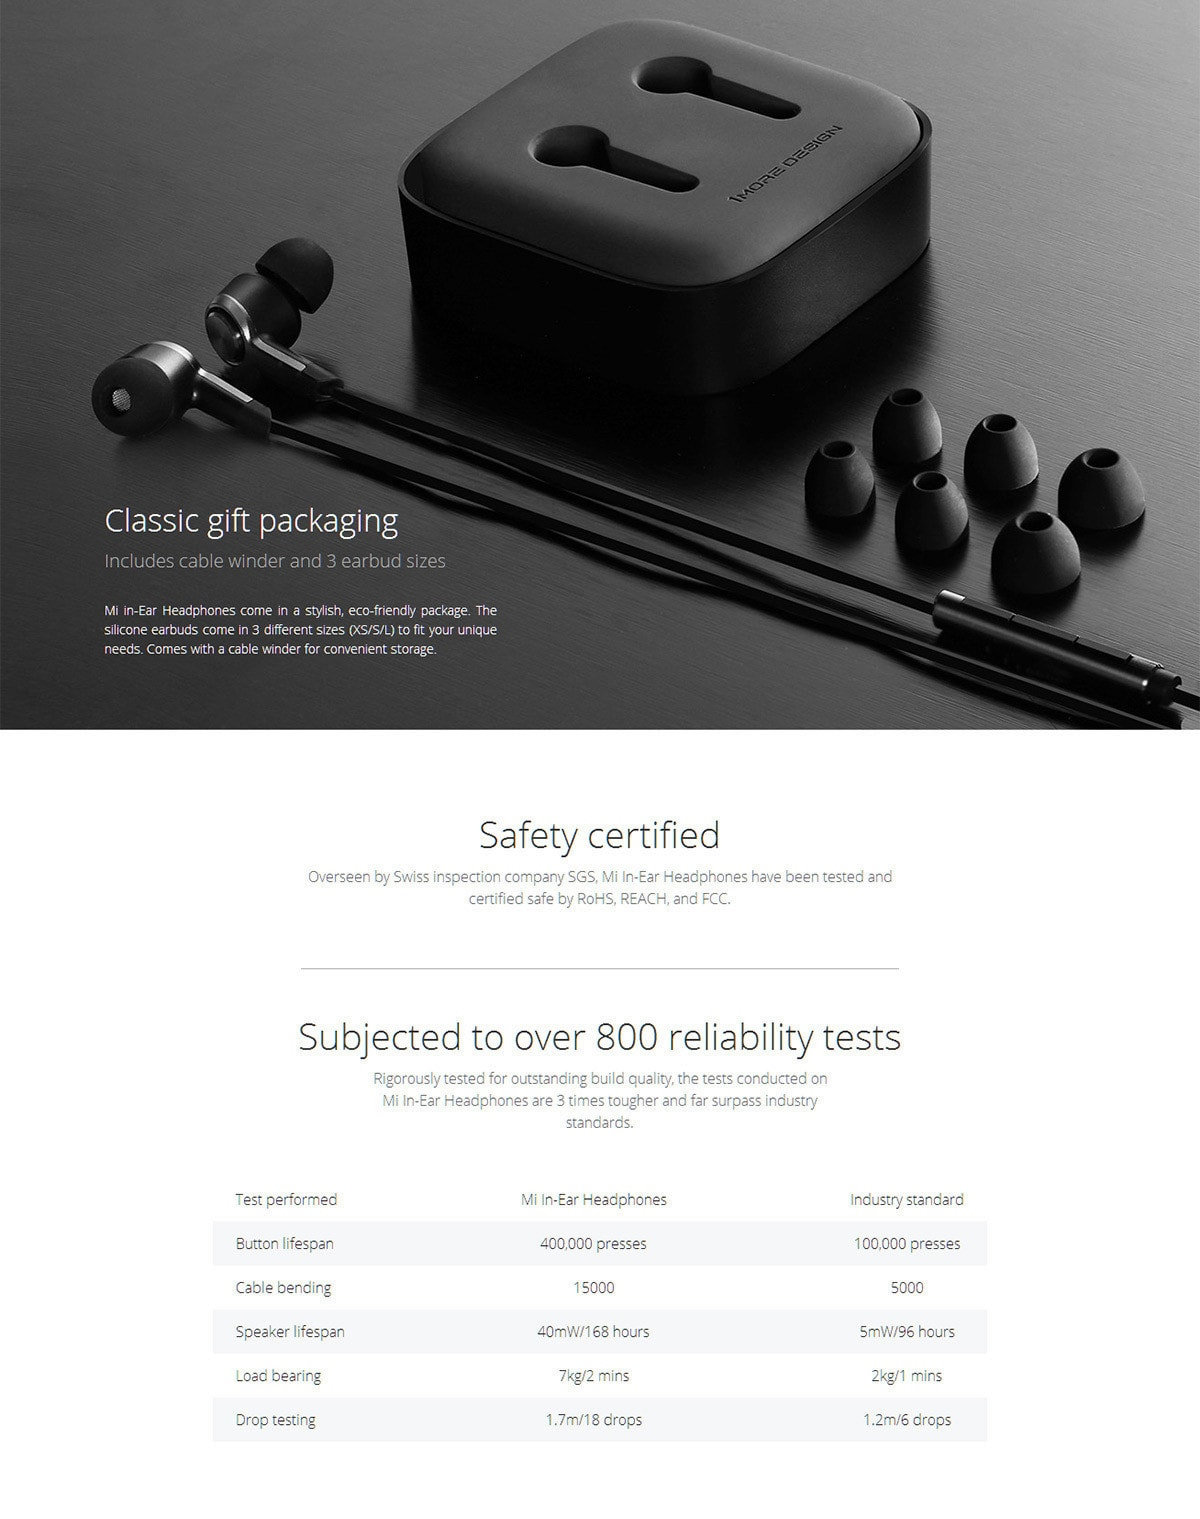 accessoires smartphones - Oreillettes XIAOMI Piston 3 Redot Design - 17